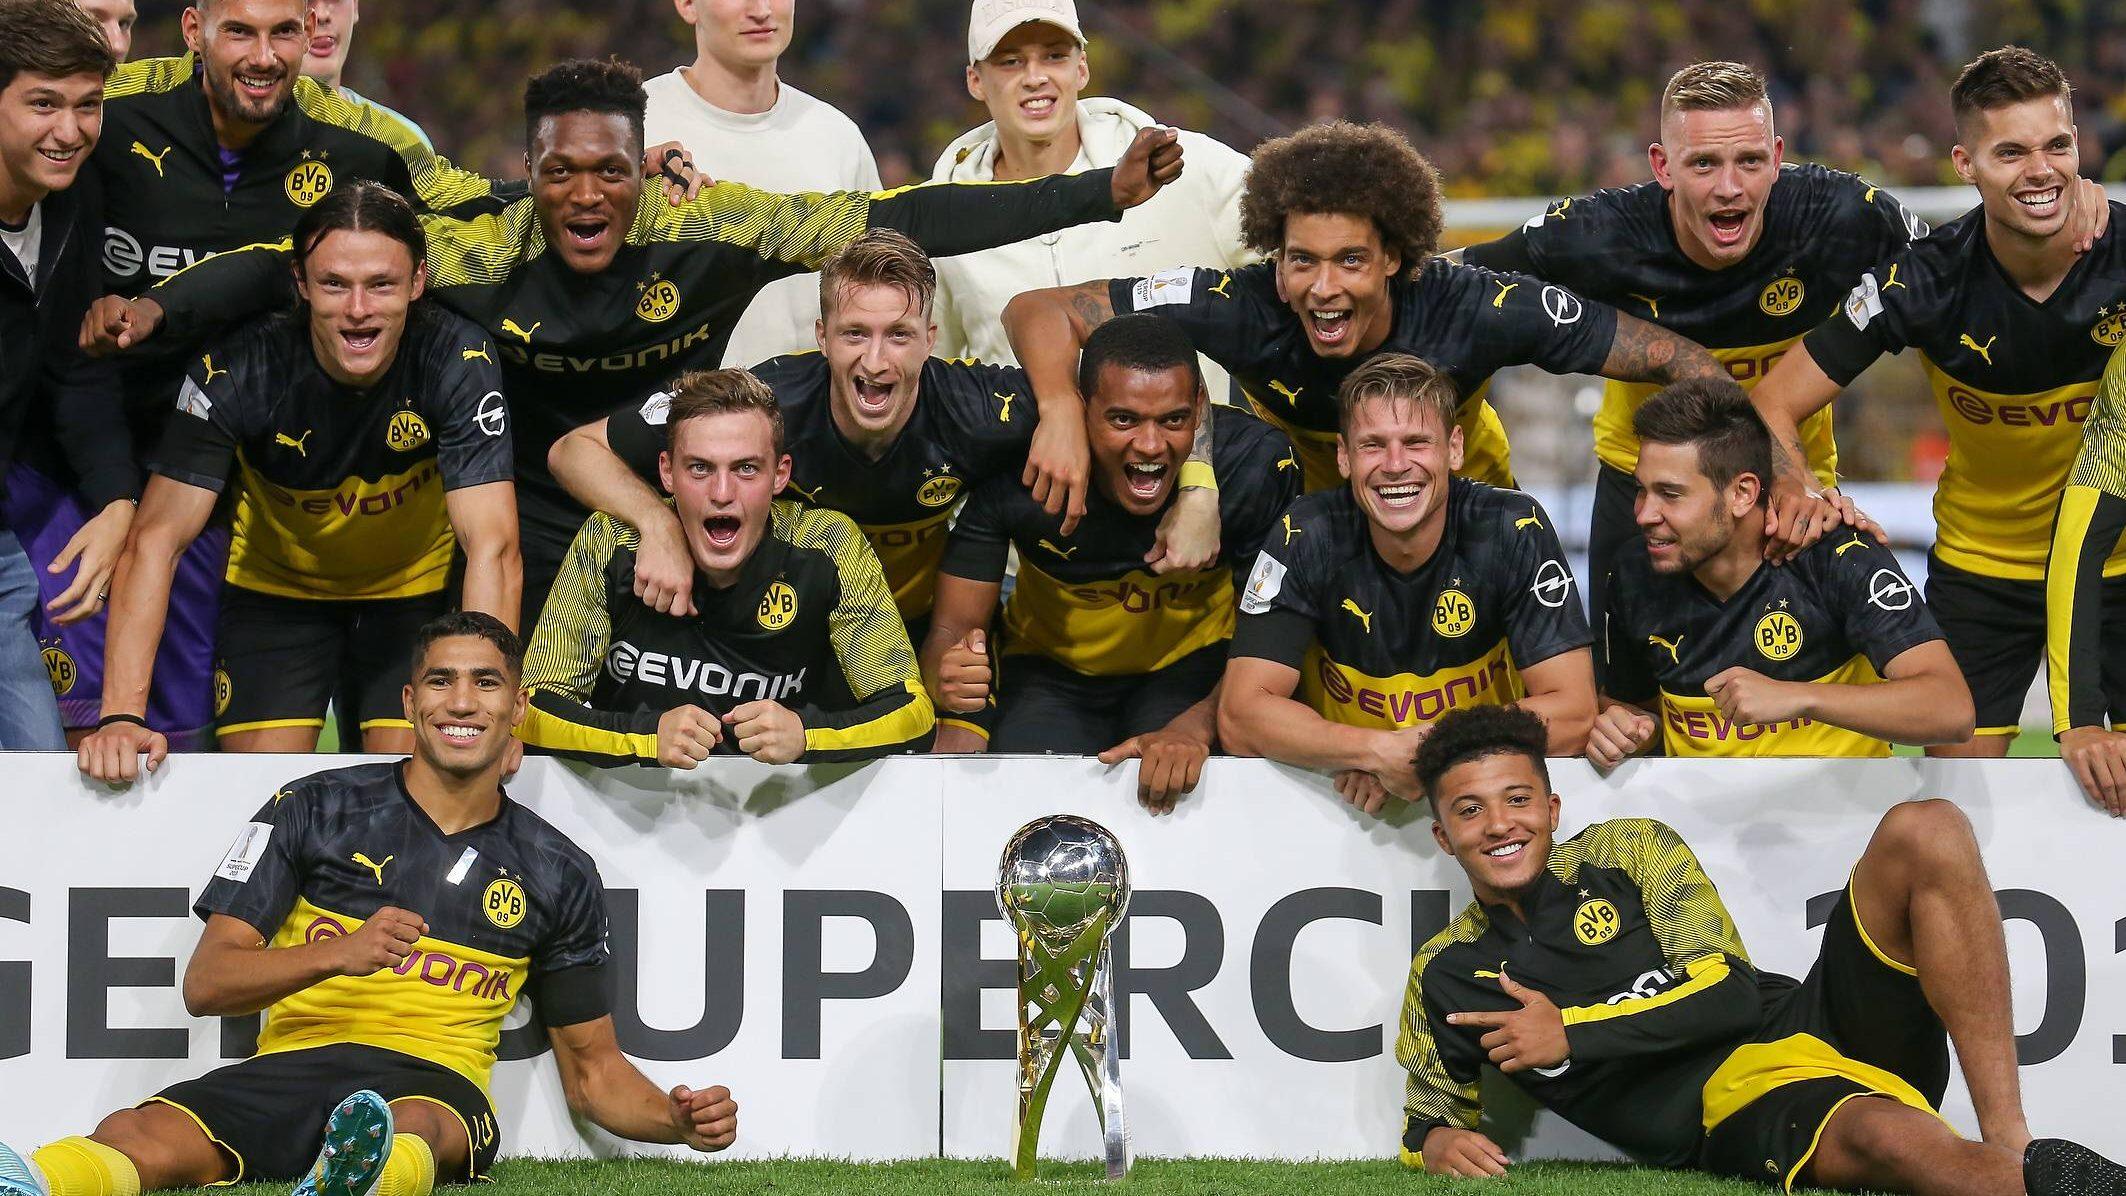 Bundesliga Borussia Dortmund 2019 20 Season Preview